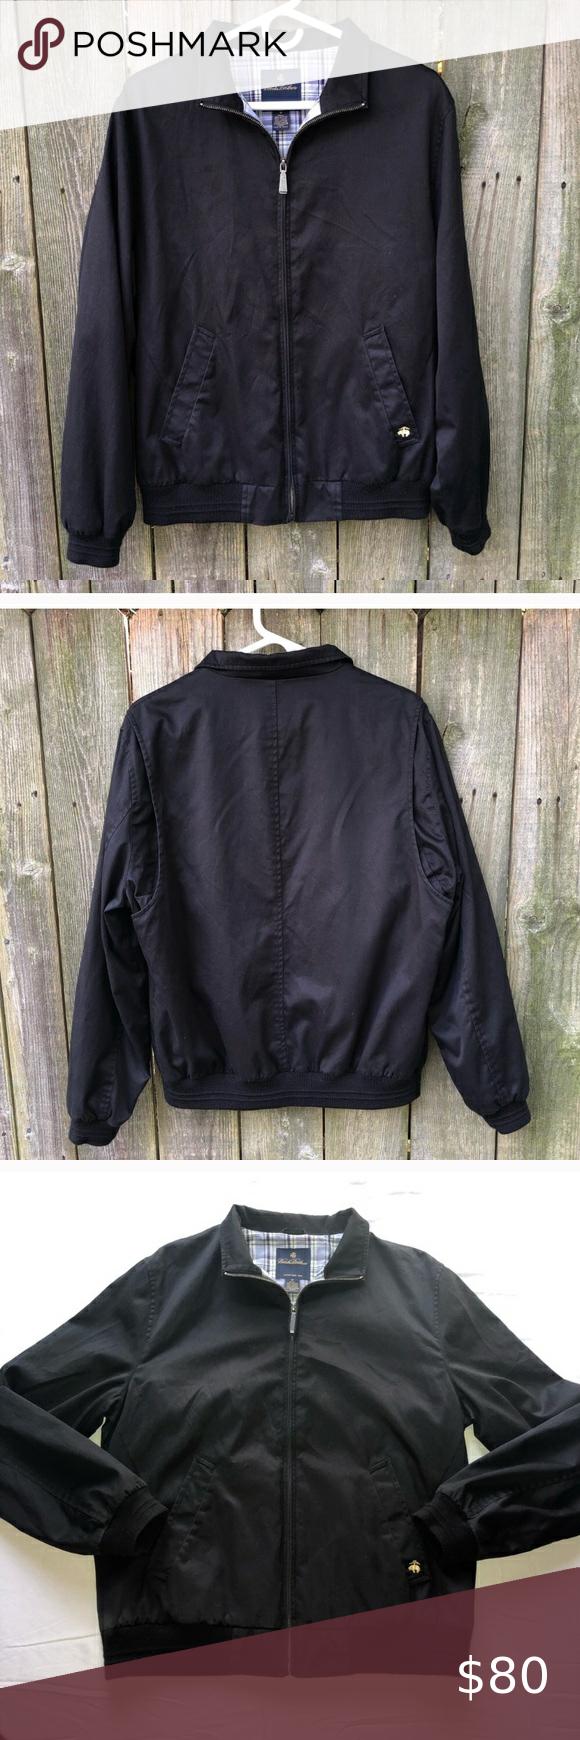 Brooks Brothers Lightweight 100 Cotton Jacket Cotton Jacket Jackets Clothes Design [ 1740 x 580 Pixel ]